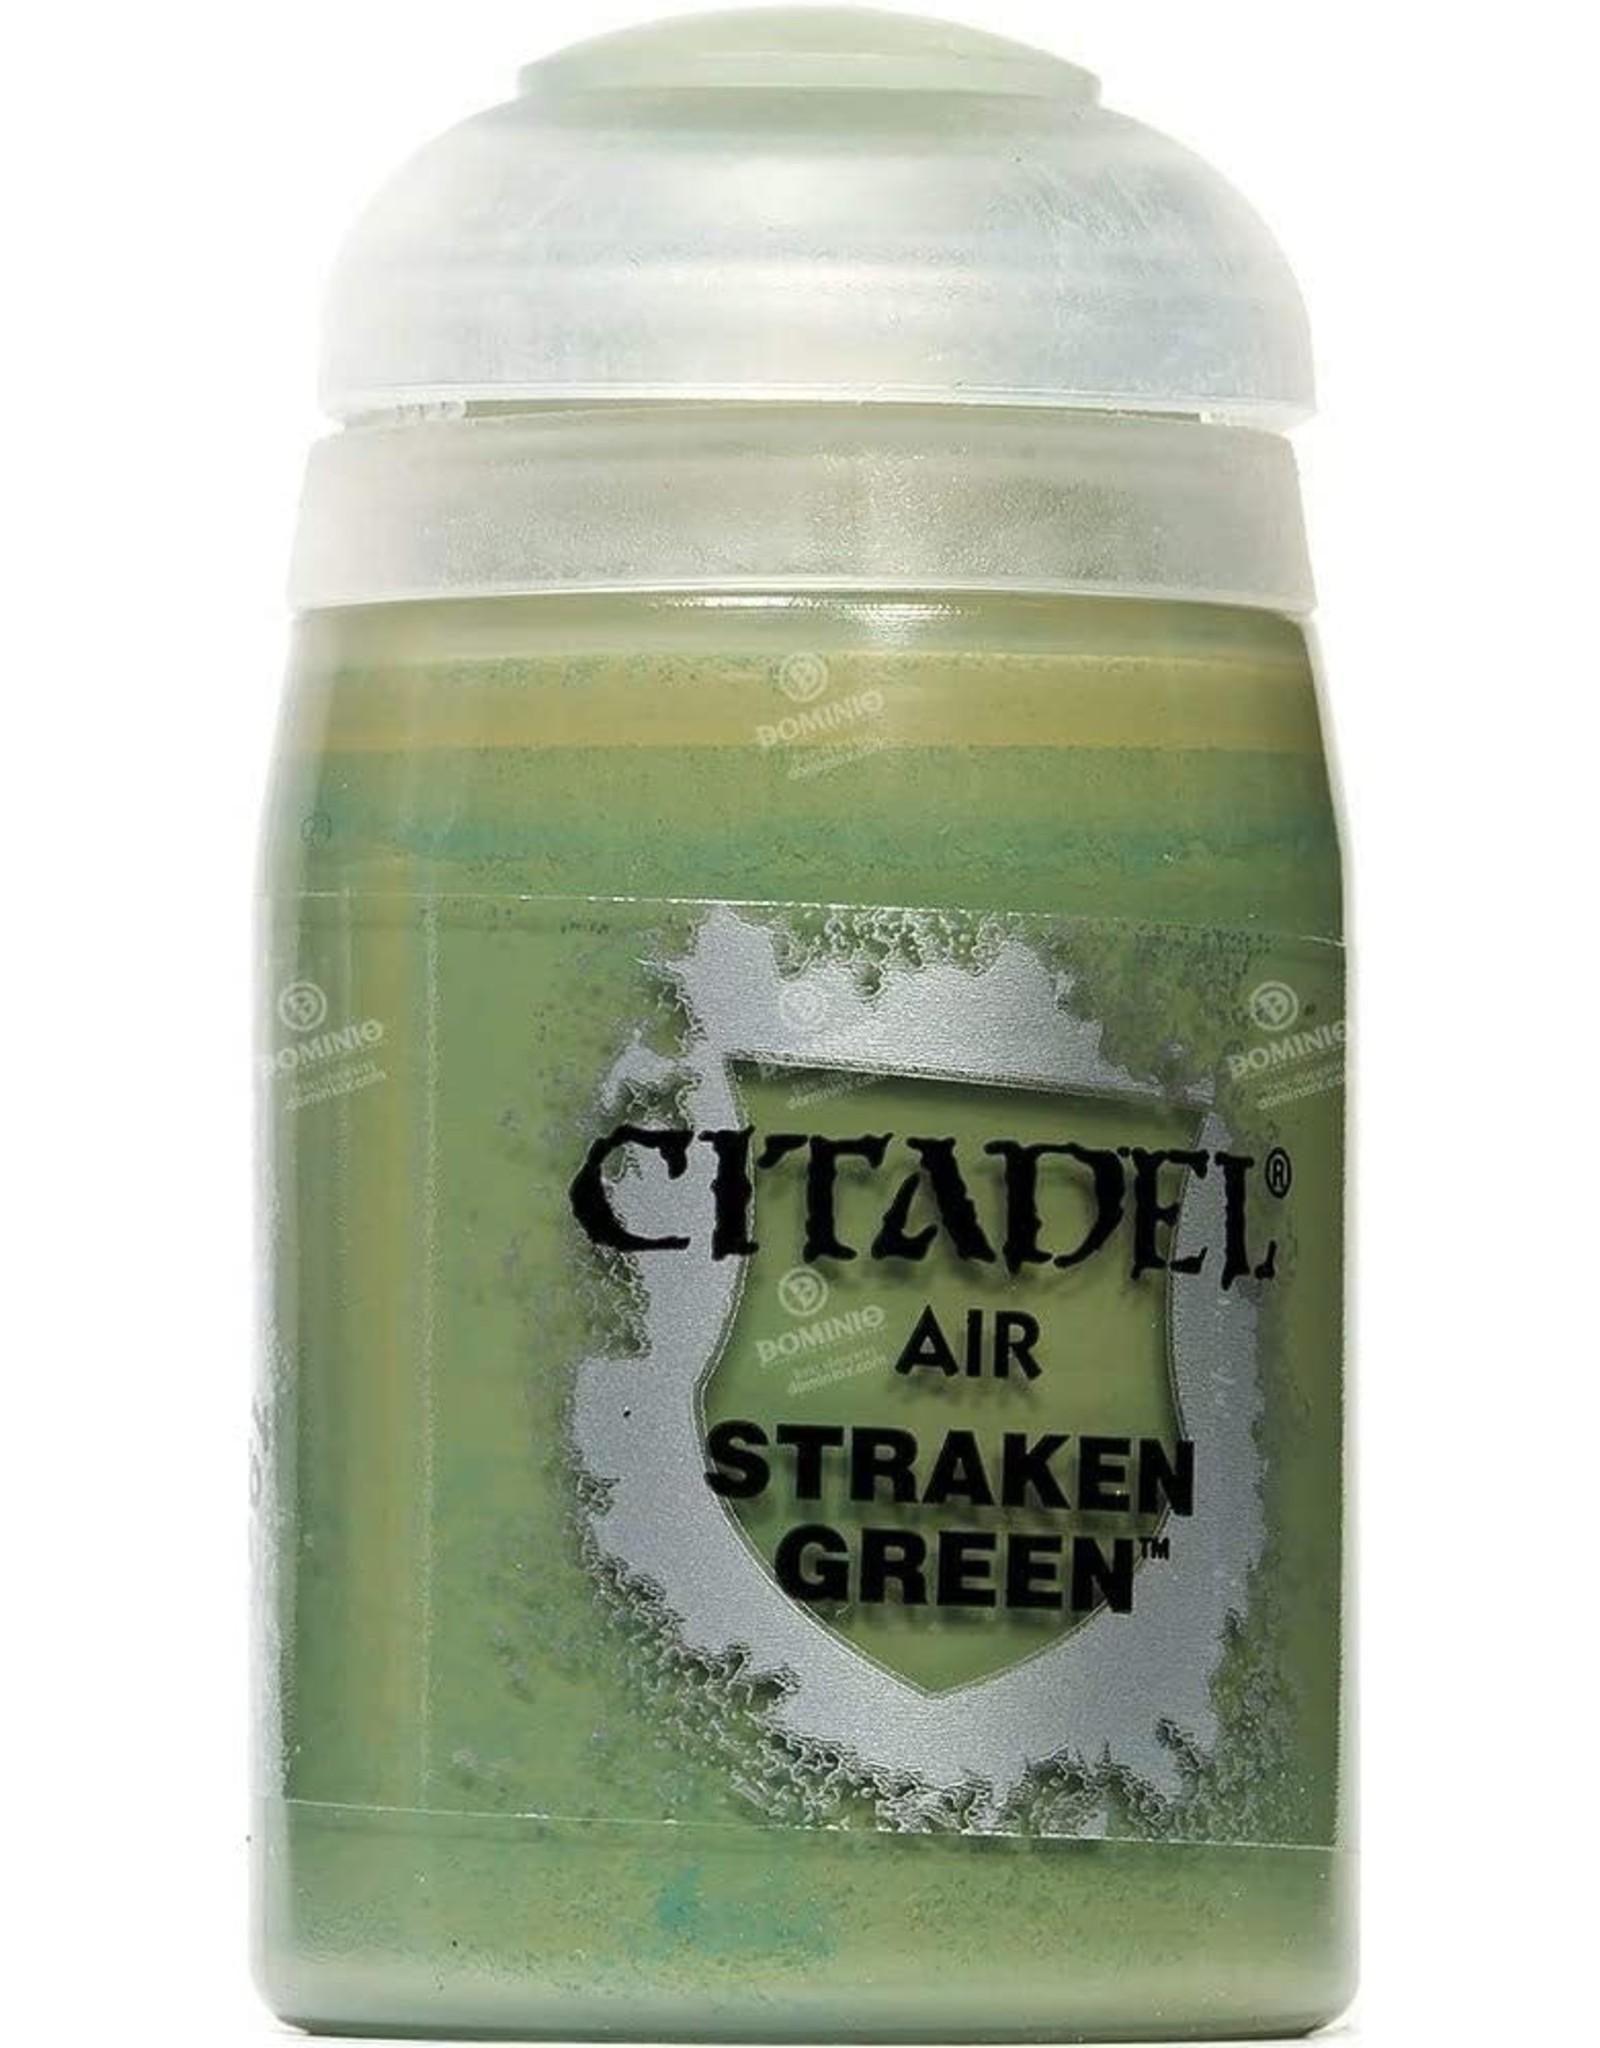 Games Workshop Citadel Paint: Straken Green Air (24 ml)